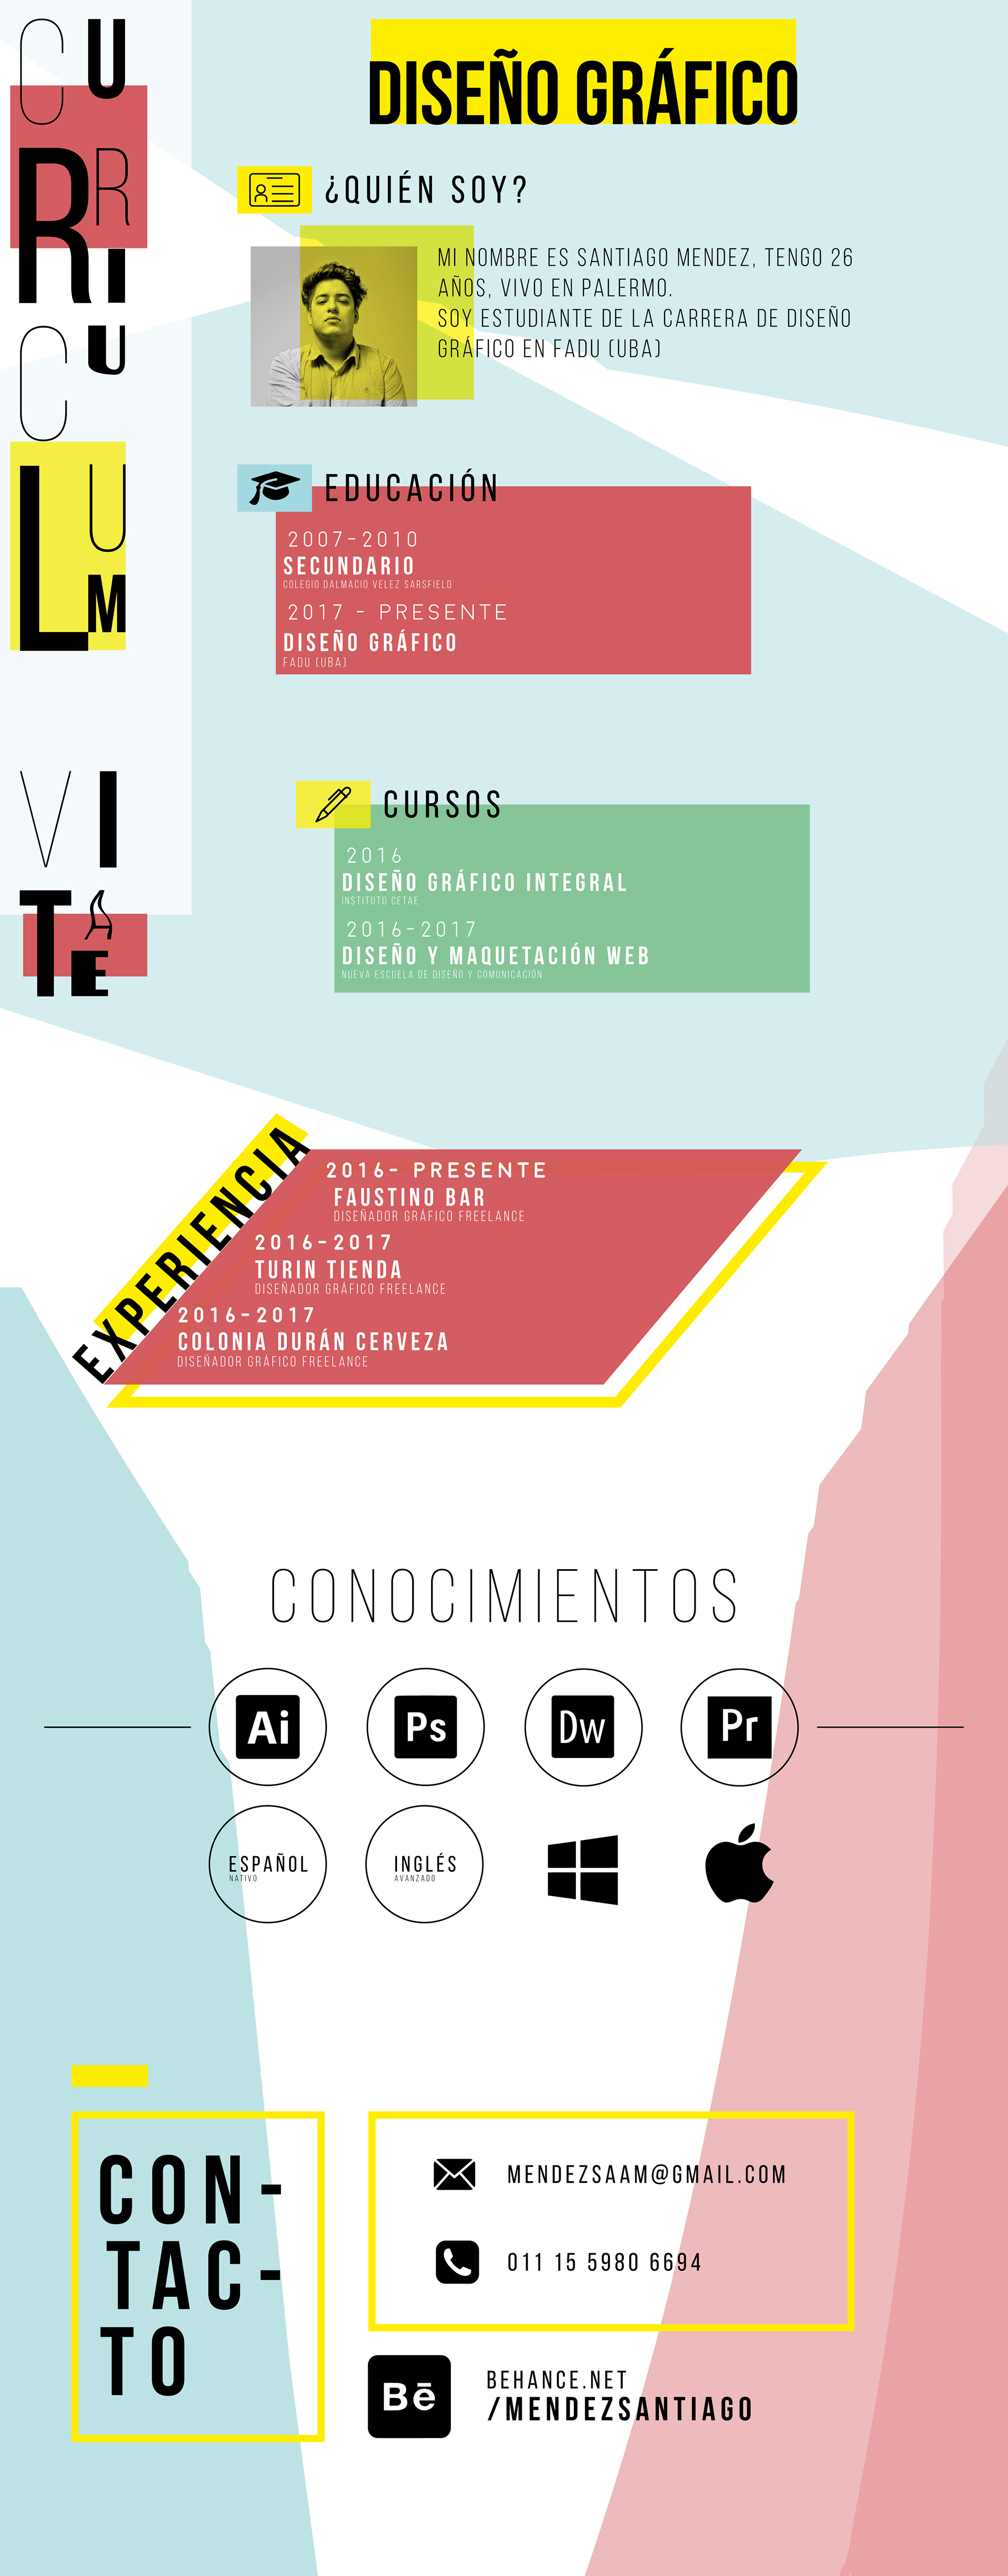 Currículum vítae: 7 ejemplos de un objeto de diseño fundamental ...